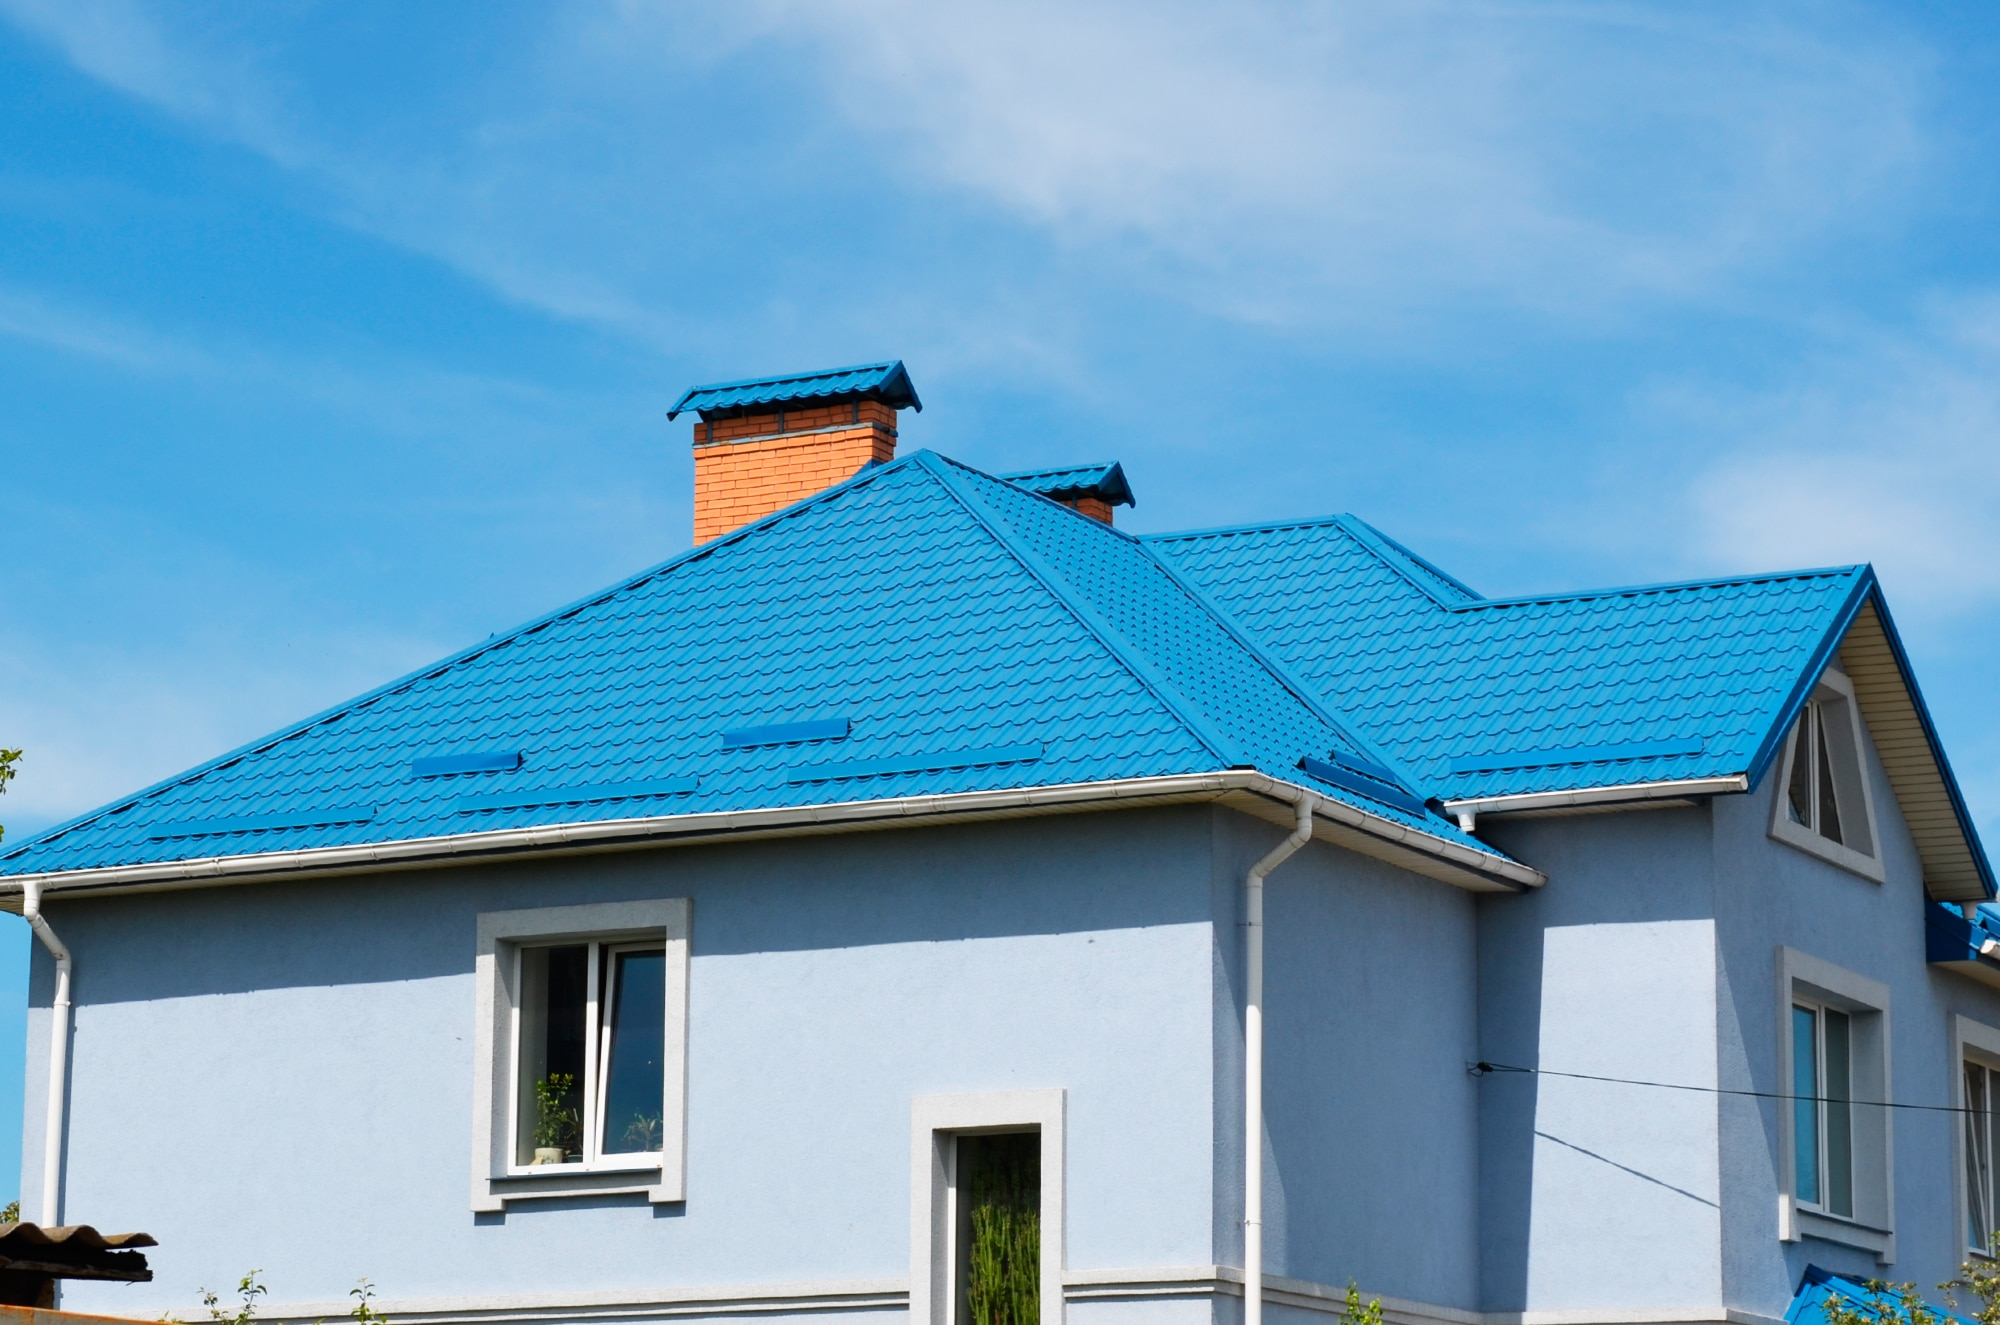 металлочерепица синяя фото домов строители